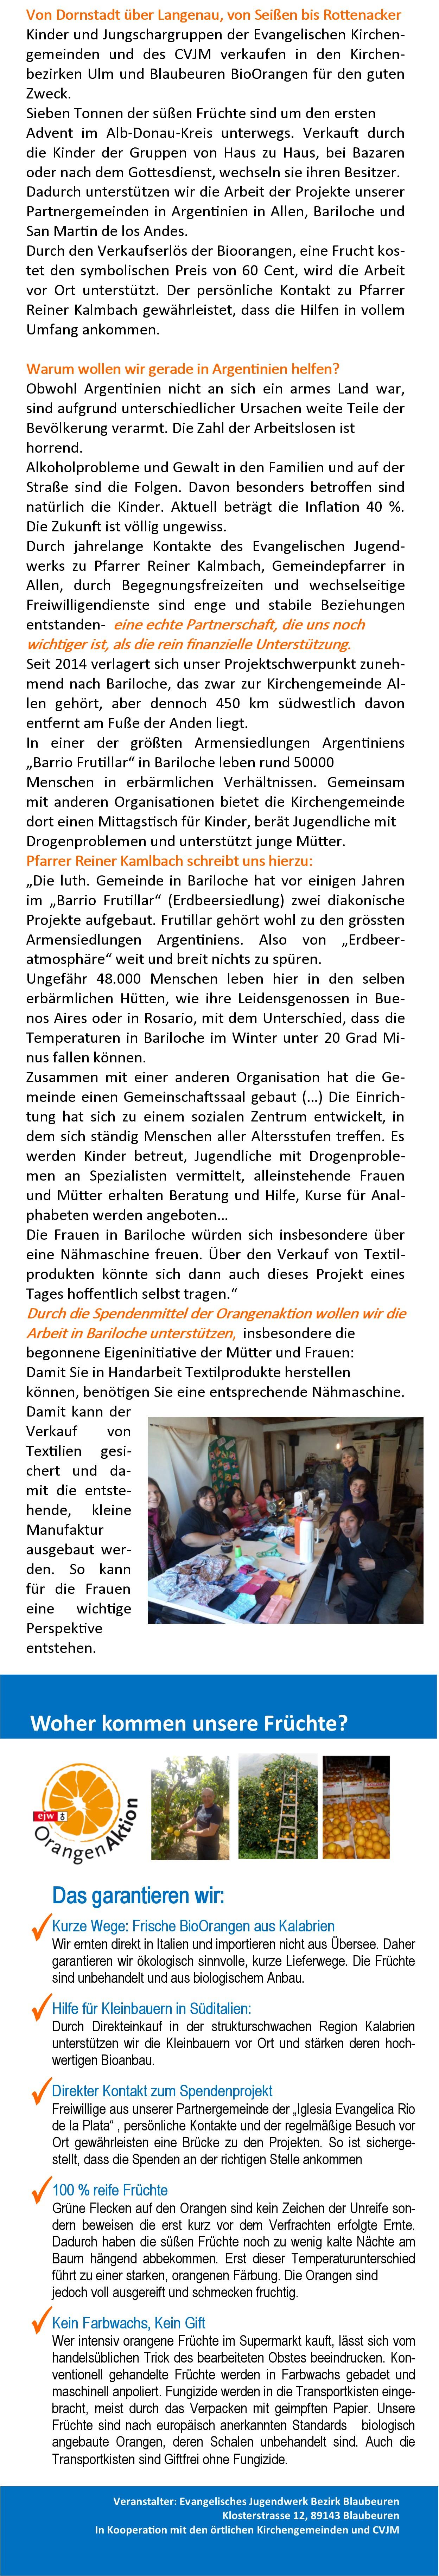 spendenprojekt-2015-infos-lang